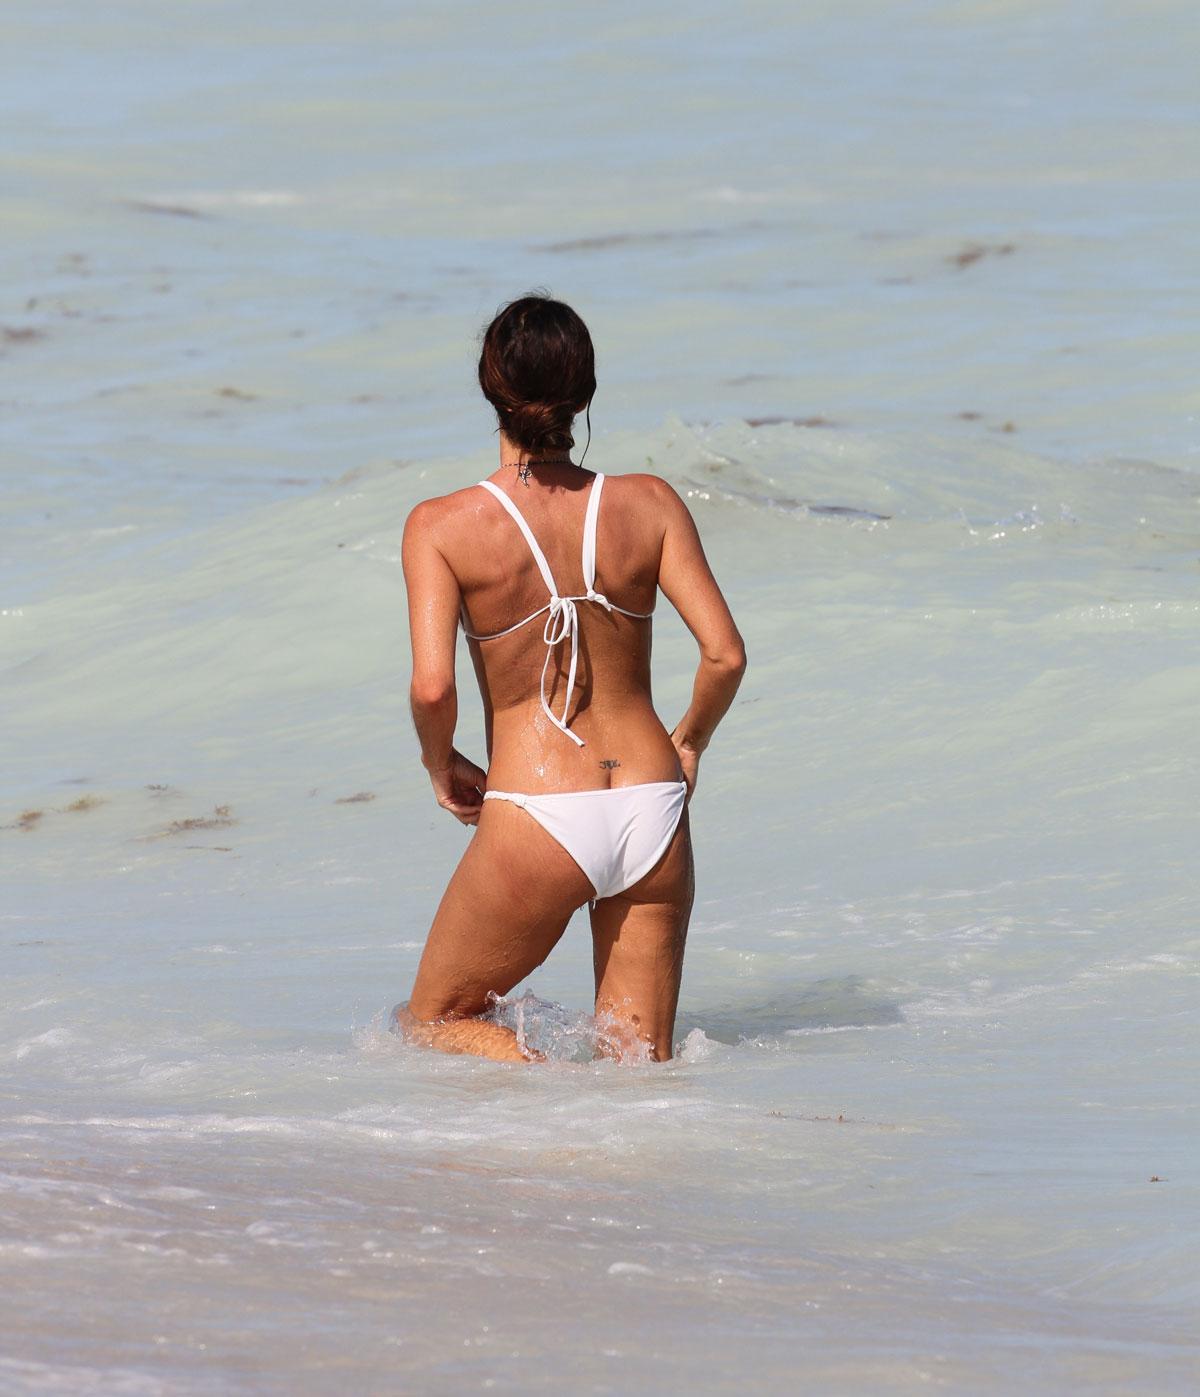 Gabrielle fitzpatrick nice guy bikini — pic 13